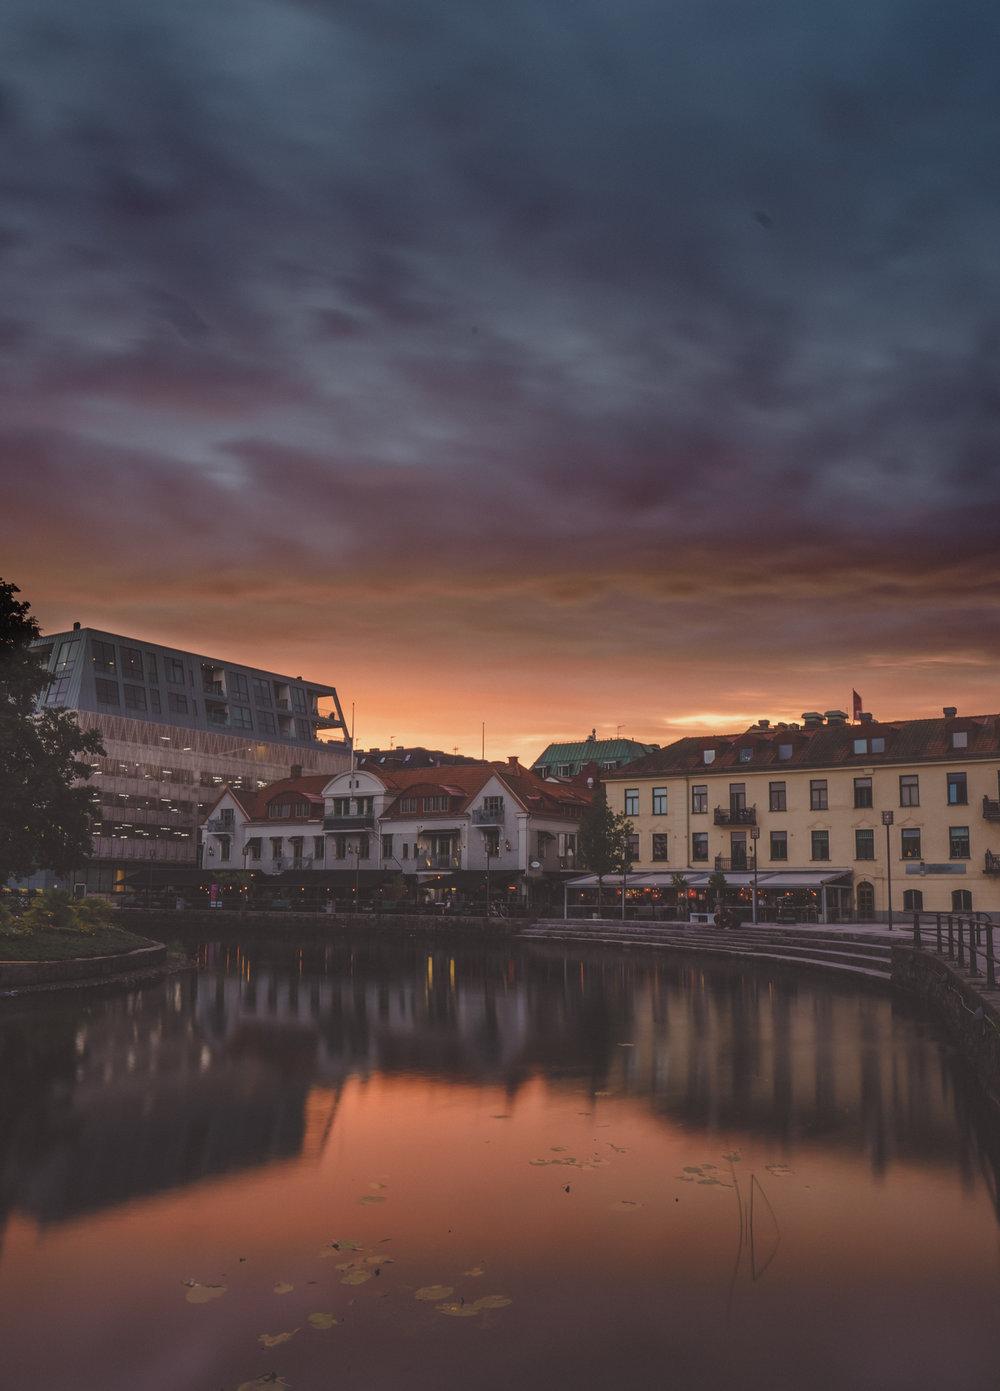 stadsfoto_borås_fotograf_max_norin-1.jpg